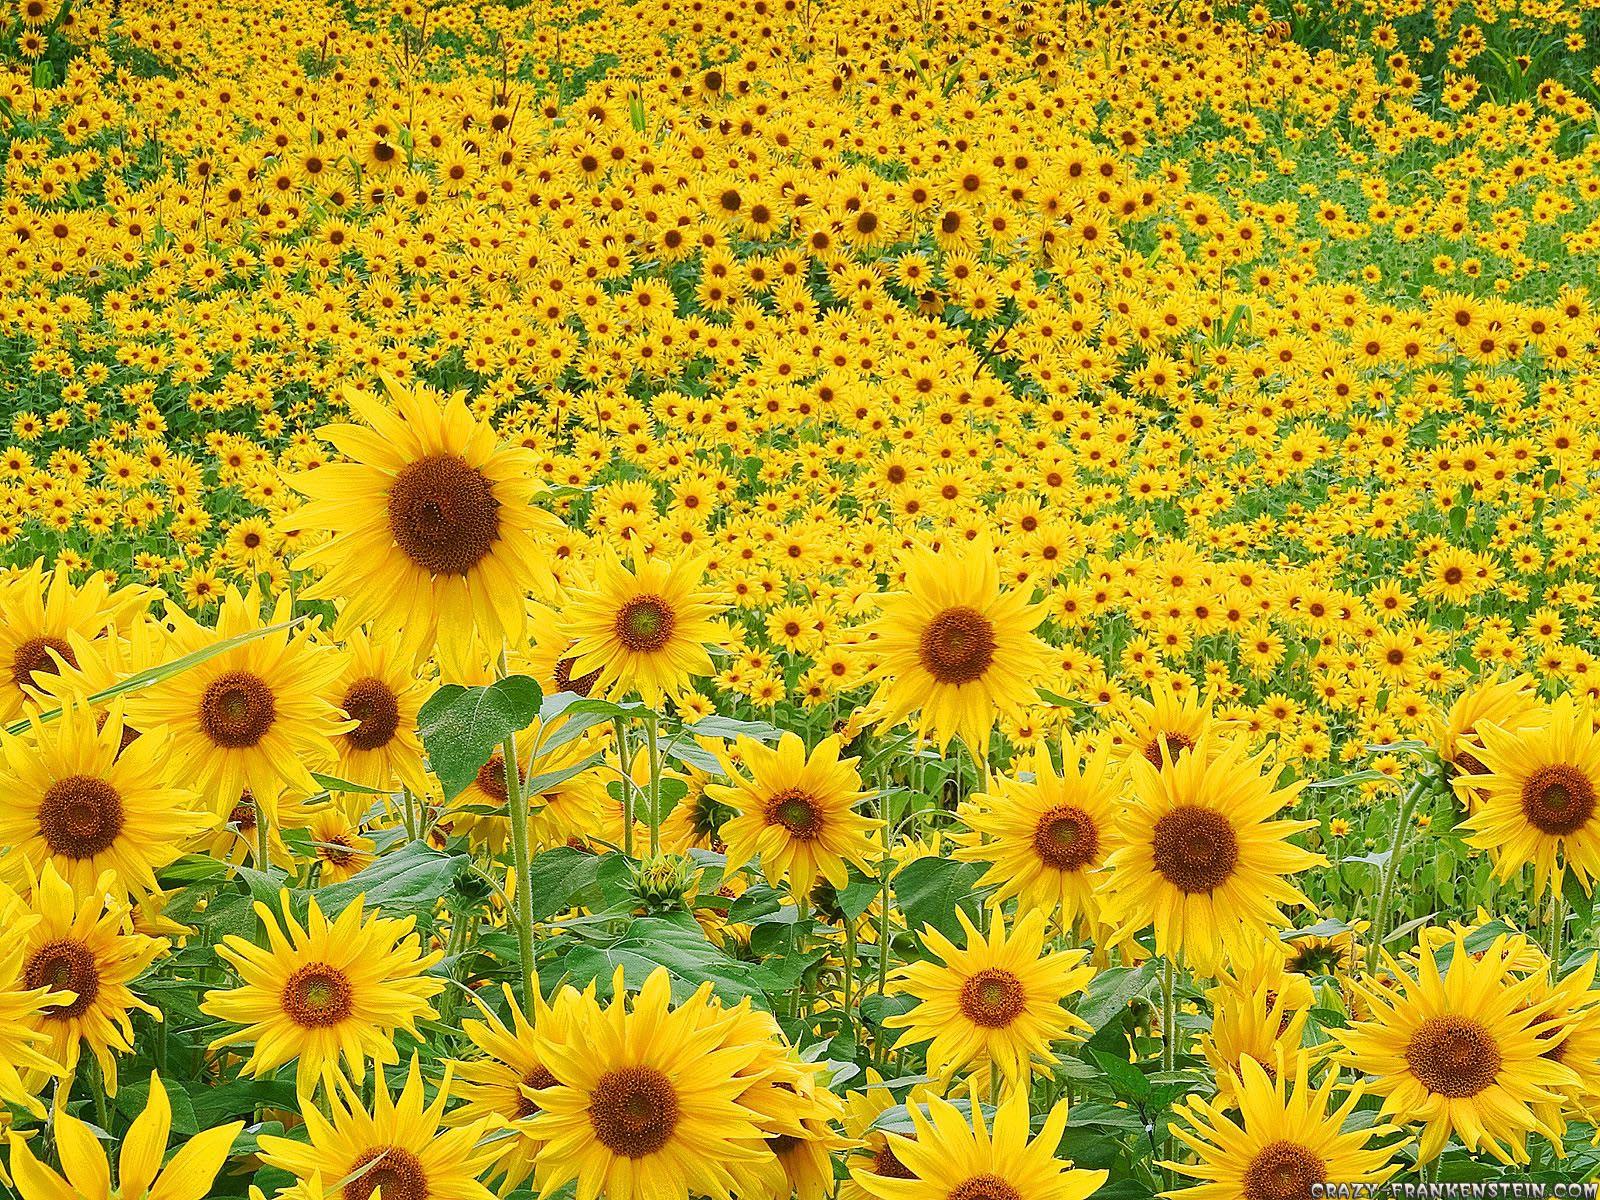 Free Wallpapers: Sunflower Wallpaper